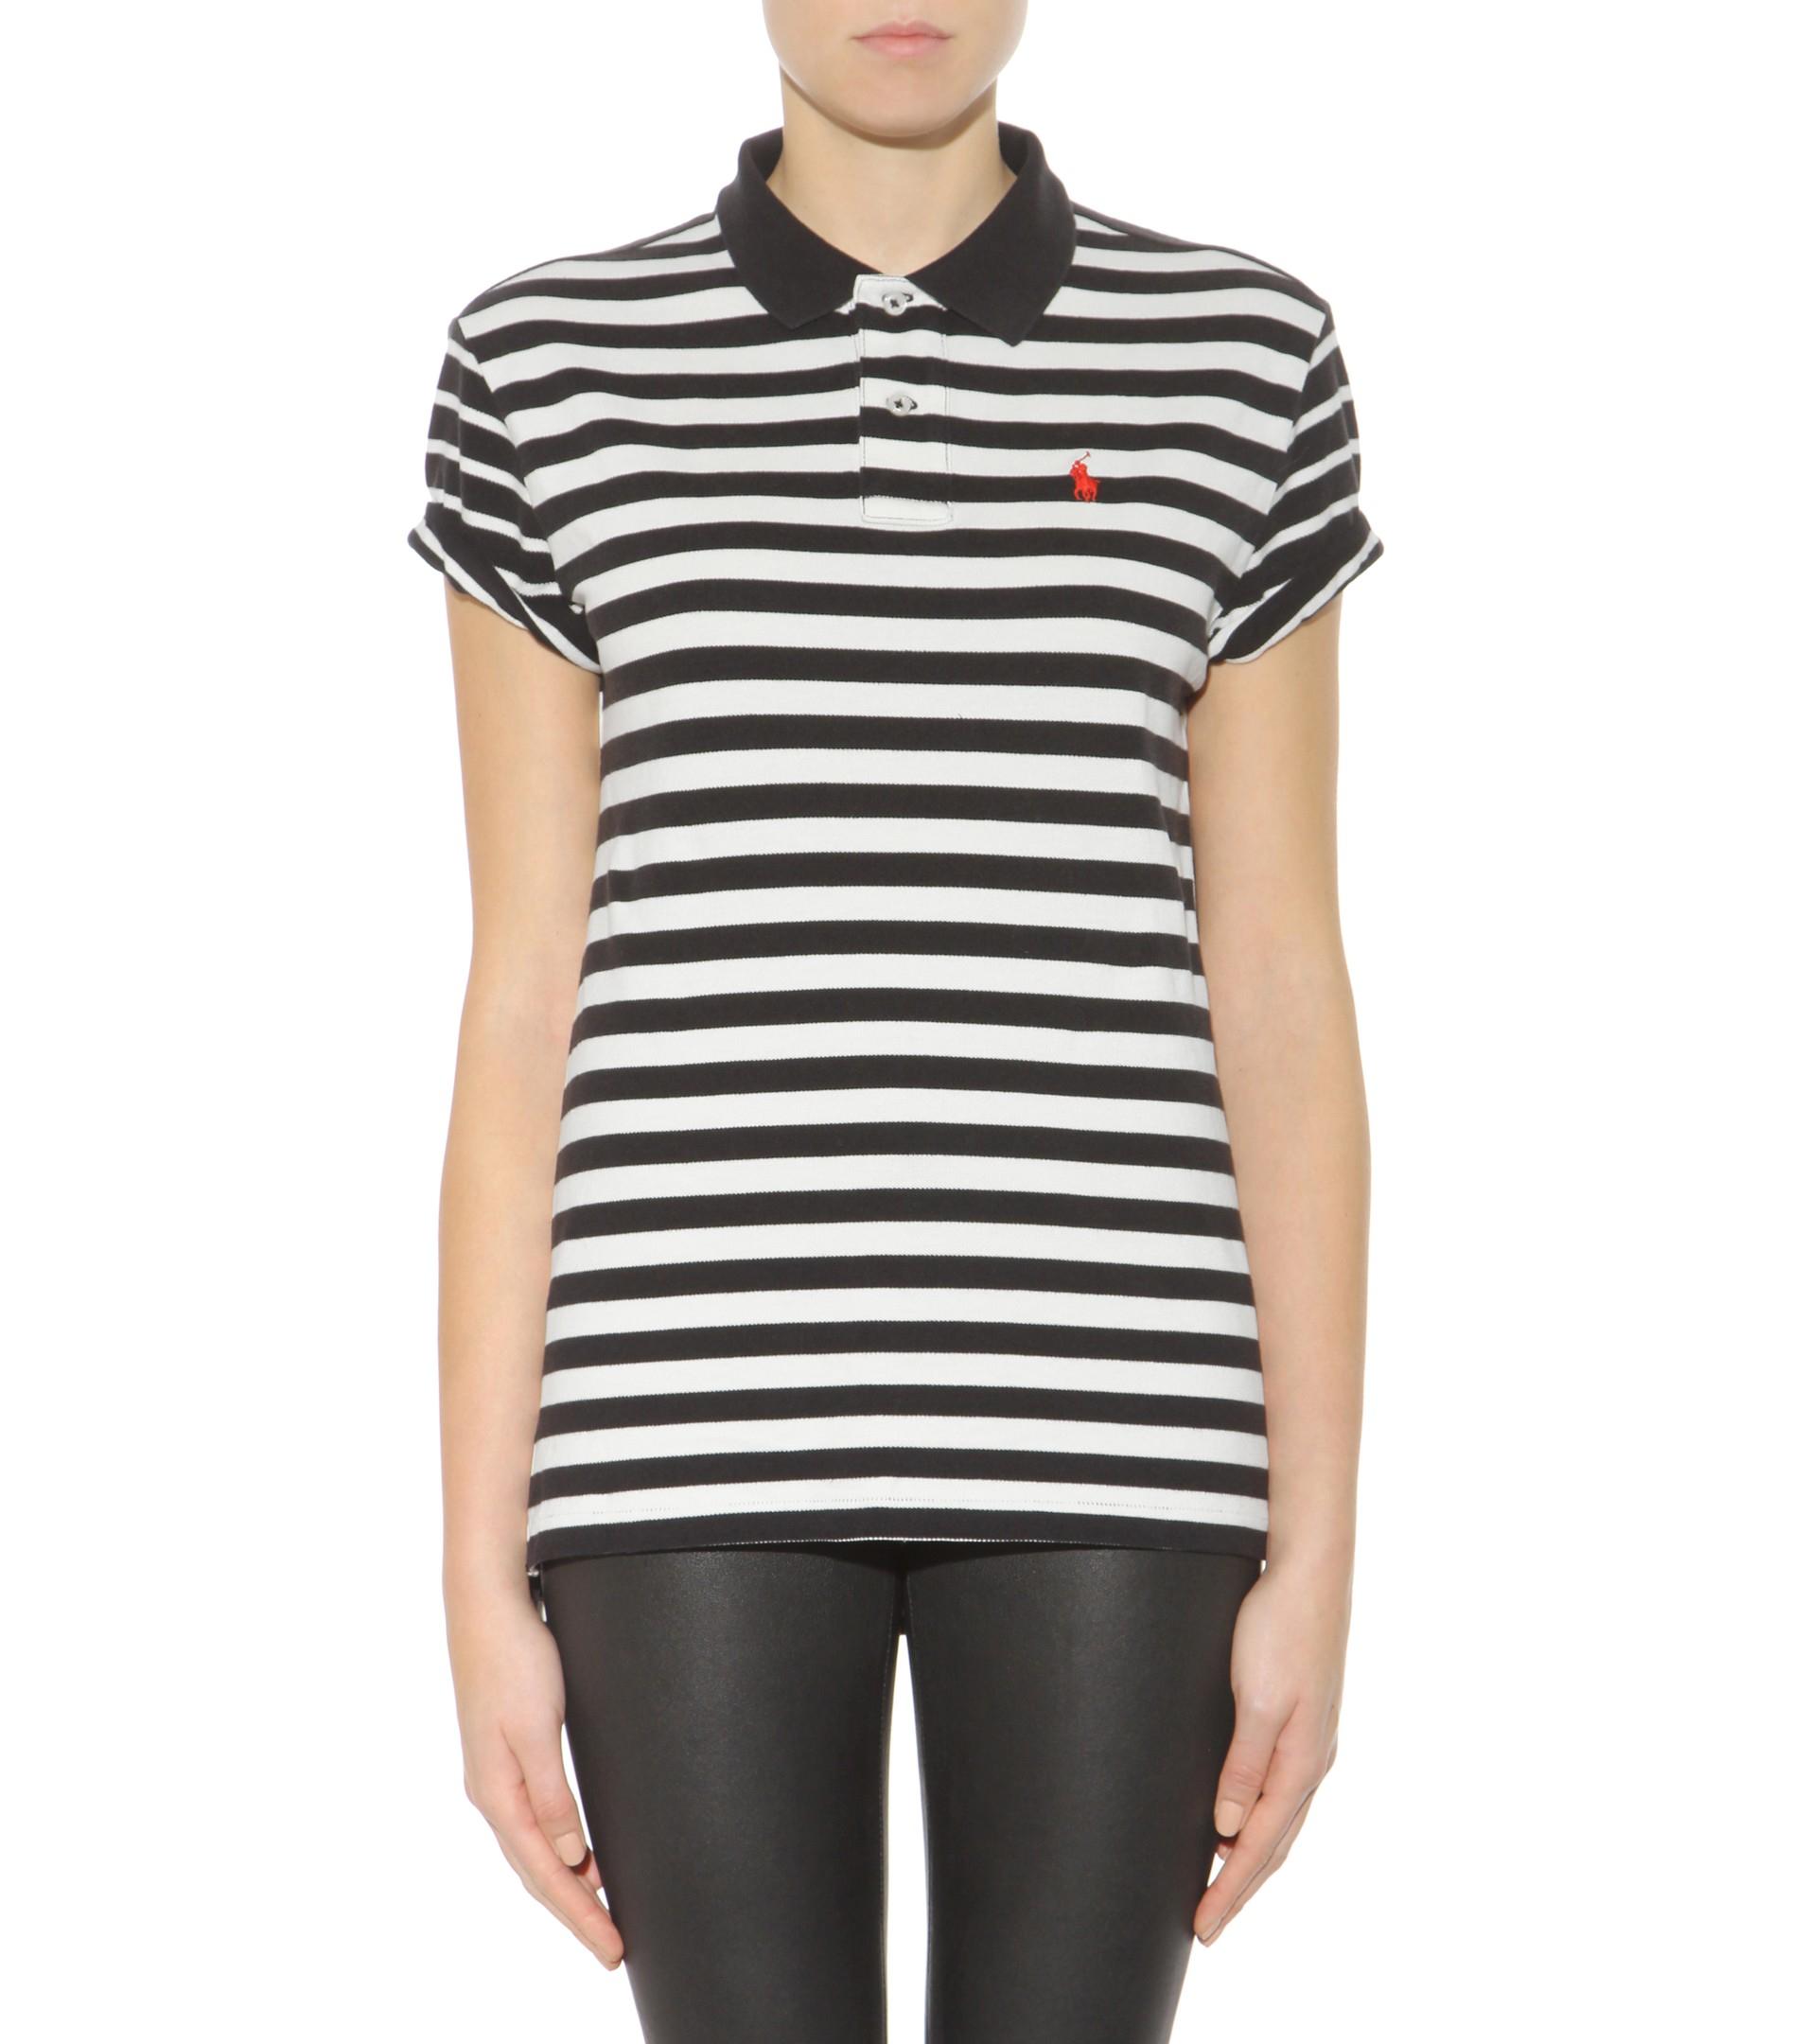 Lyst Polo Ralph Lauren Boyfriend Cotton Polo Shirt In Black